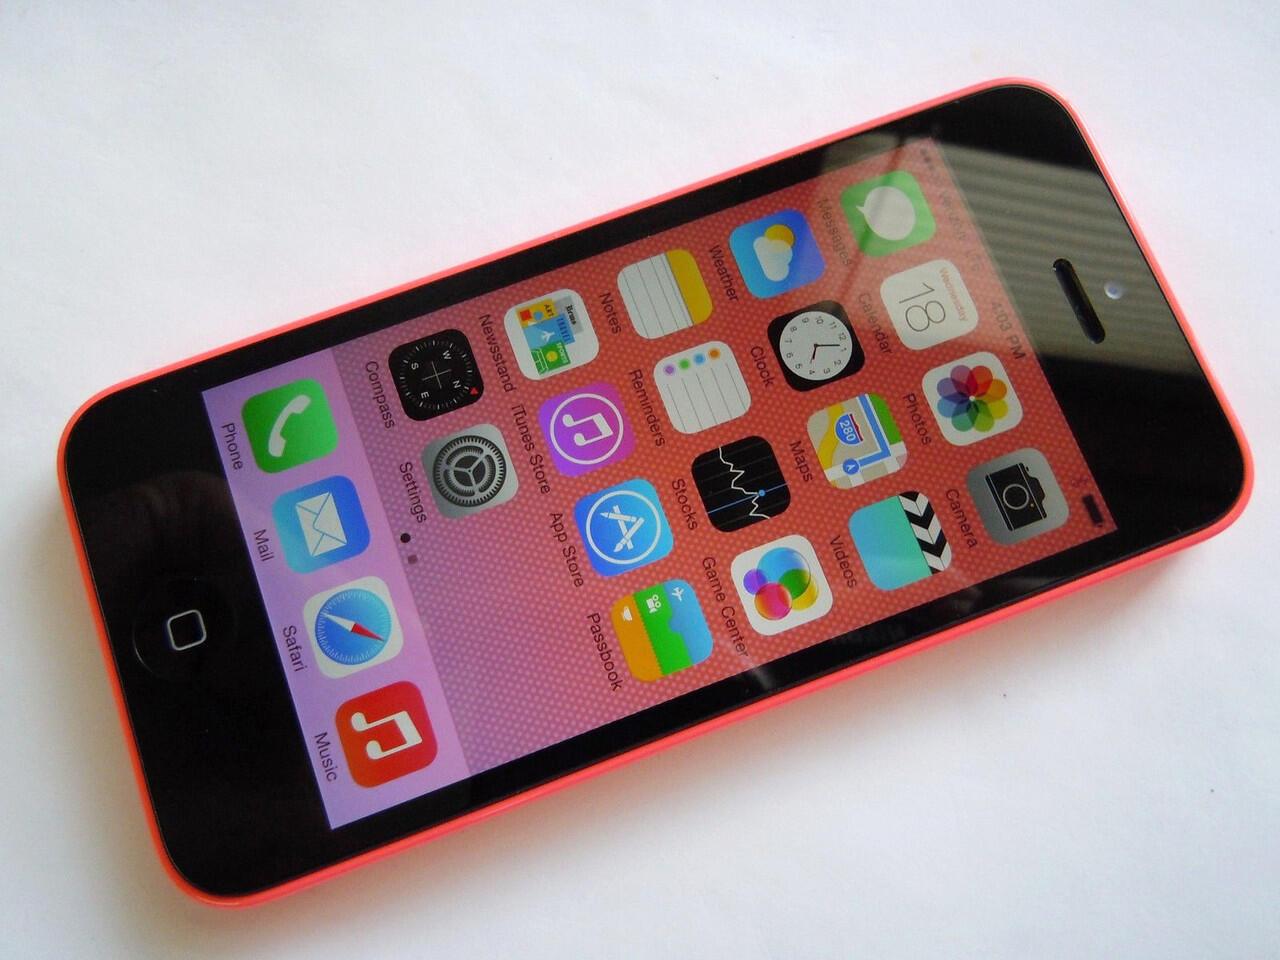 Apple iPhone 5c 16 GB Sprint Red // Pink SU Batangan